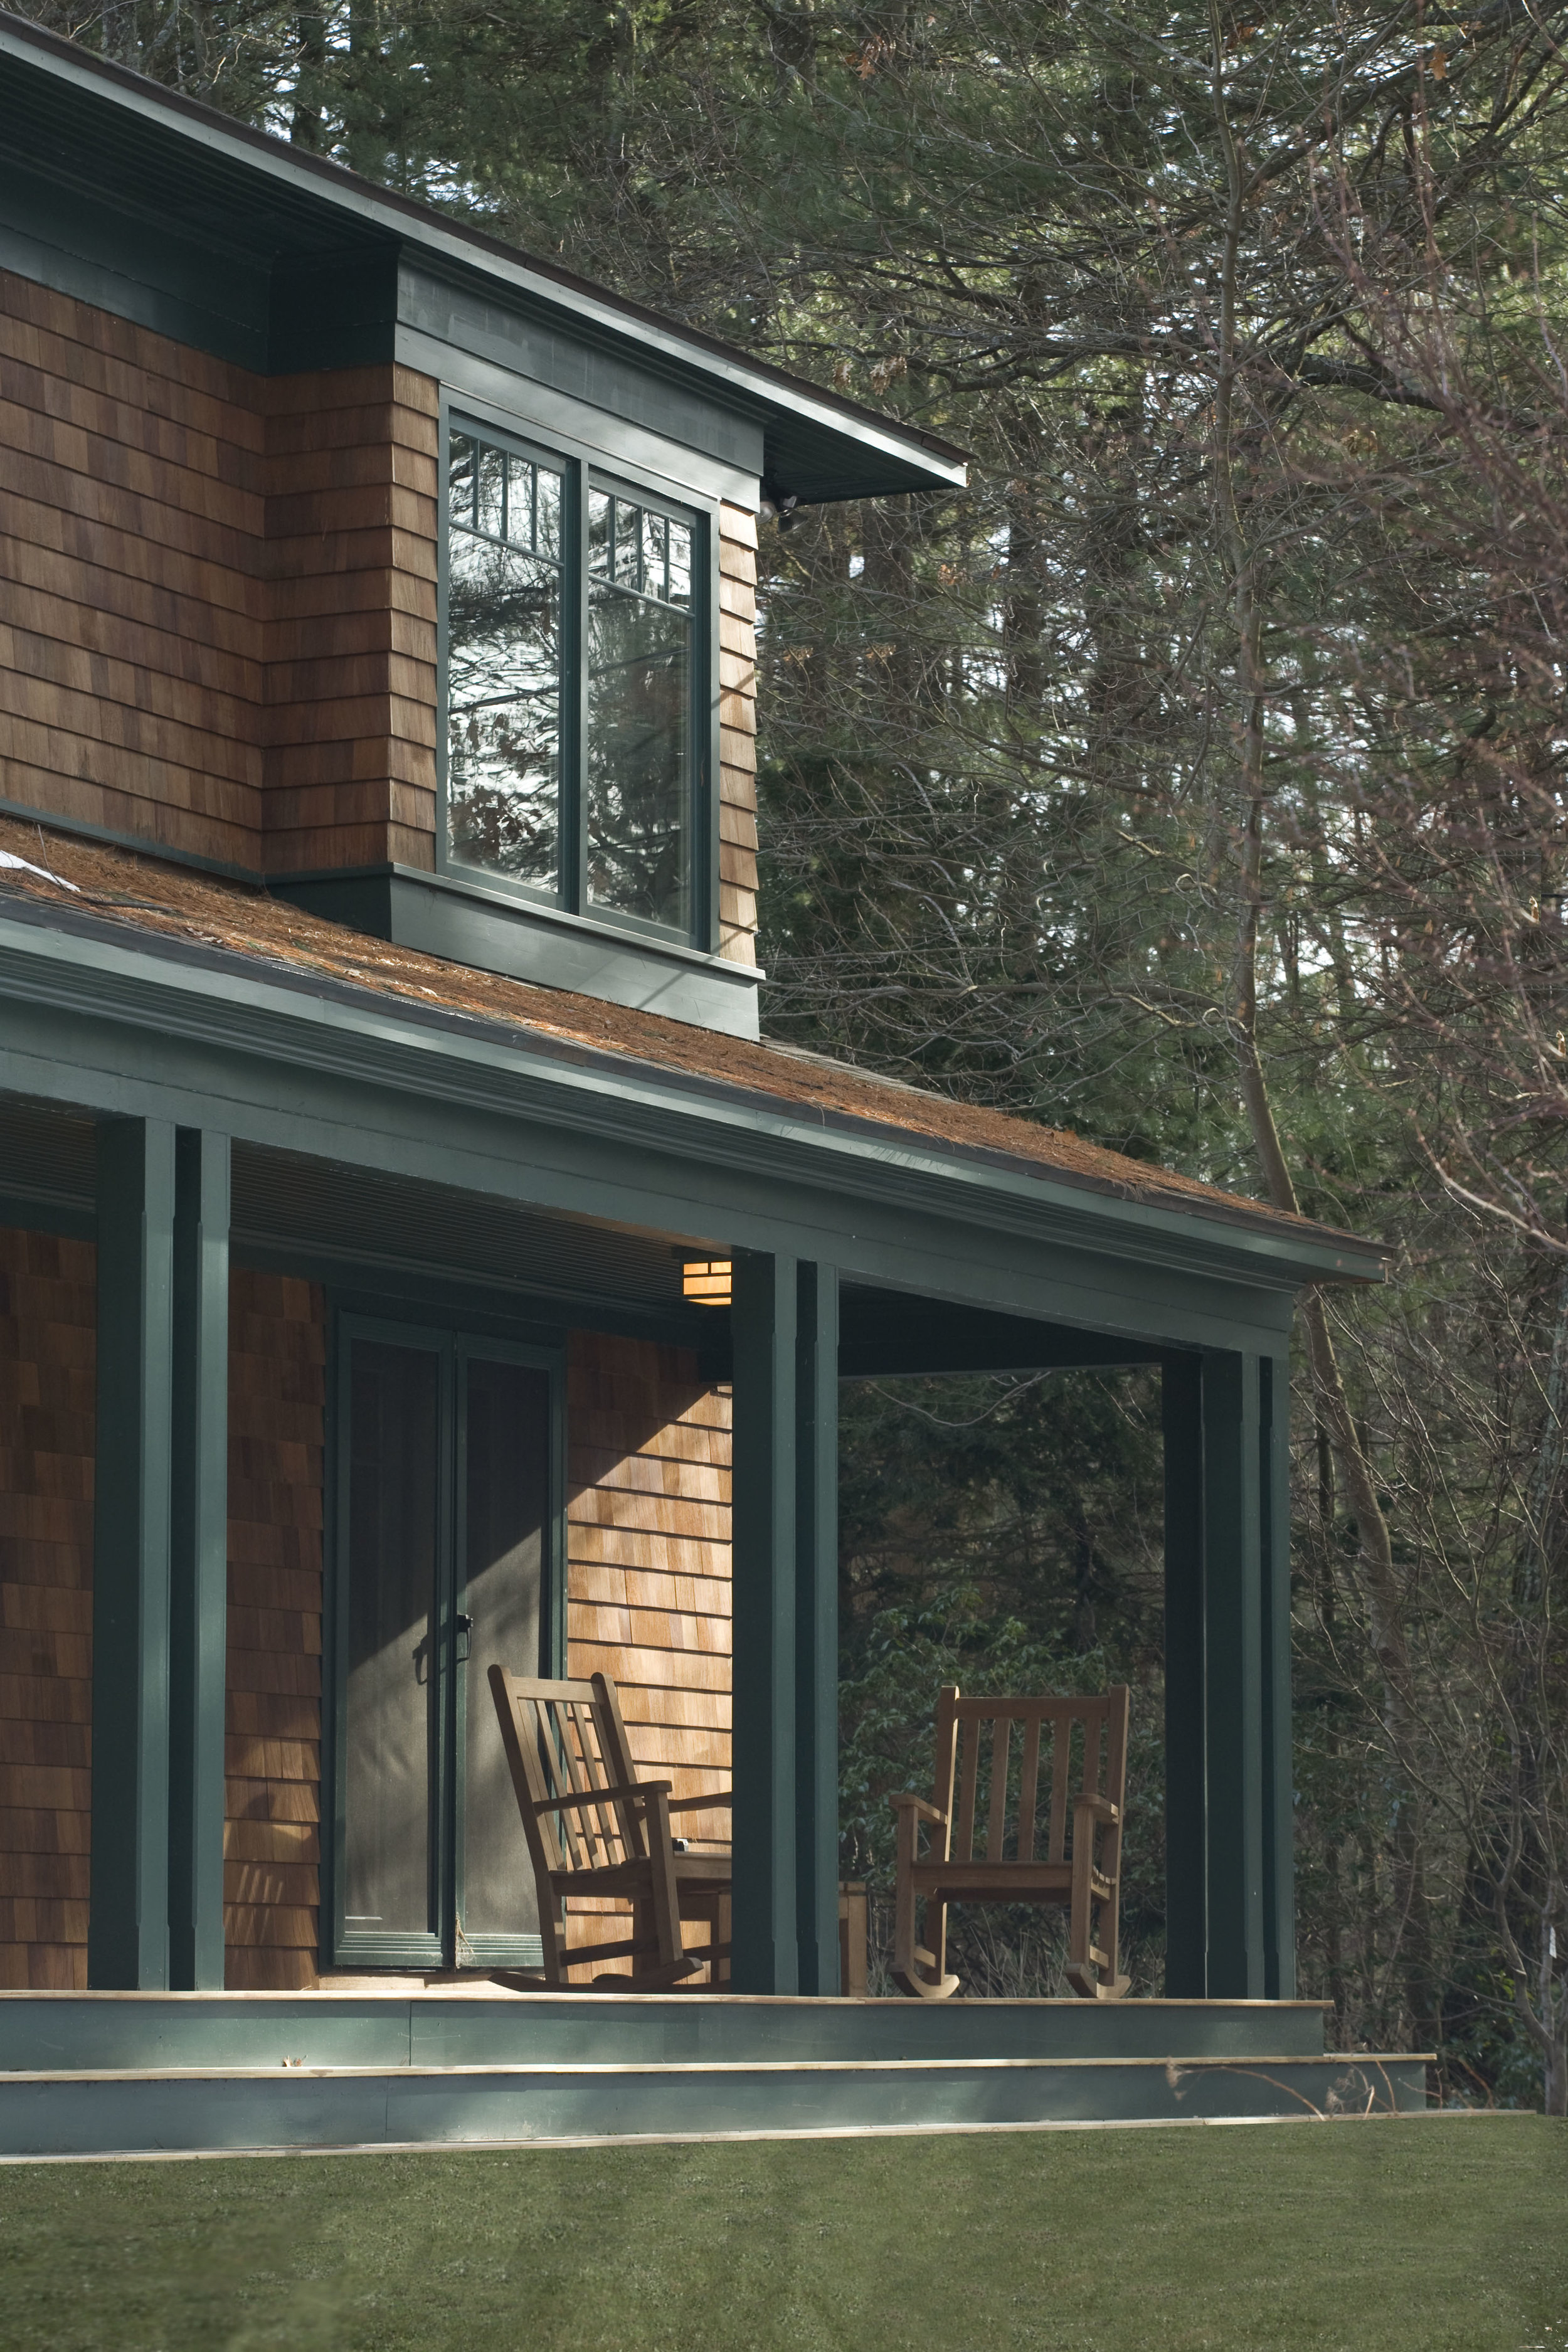 New cedar shingles